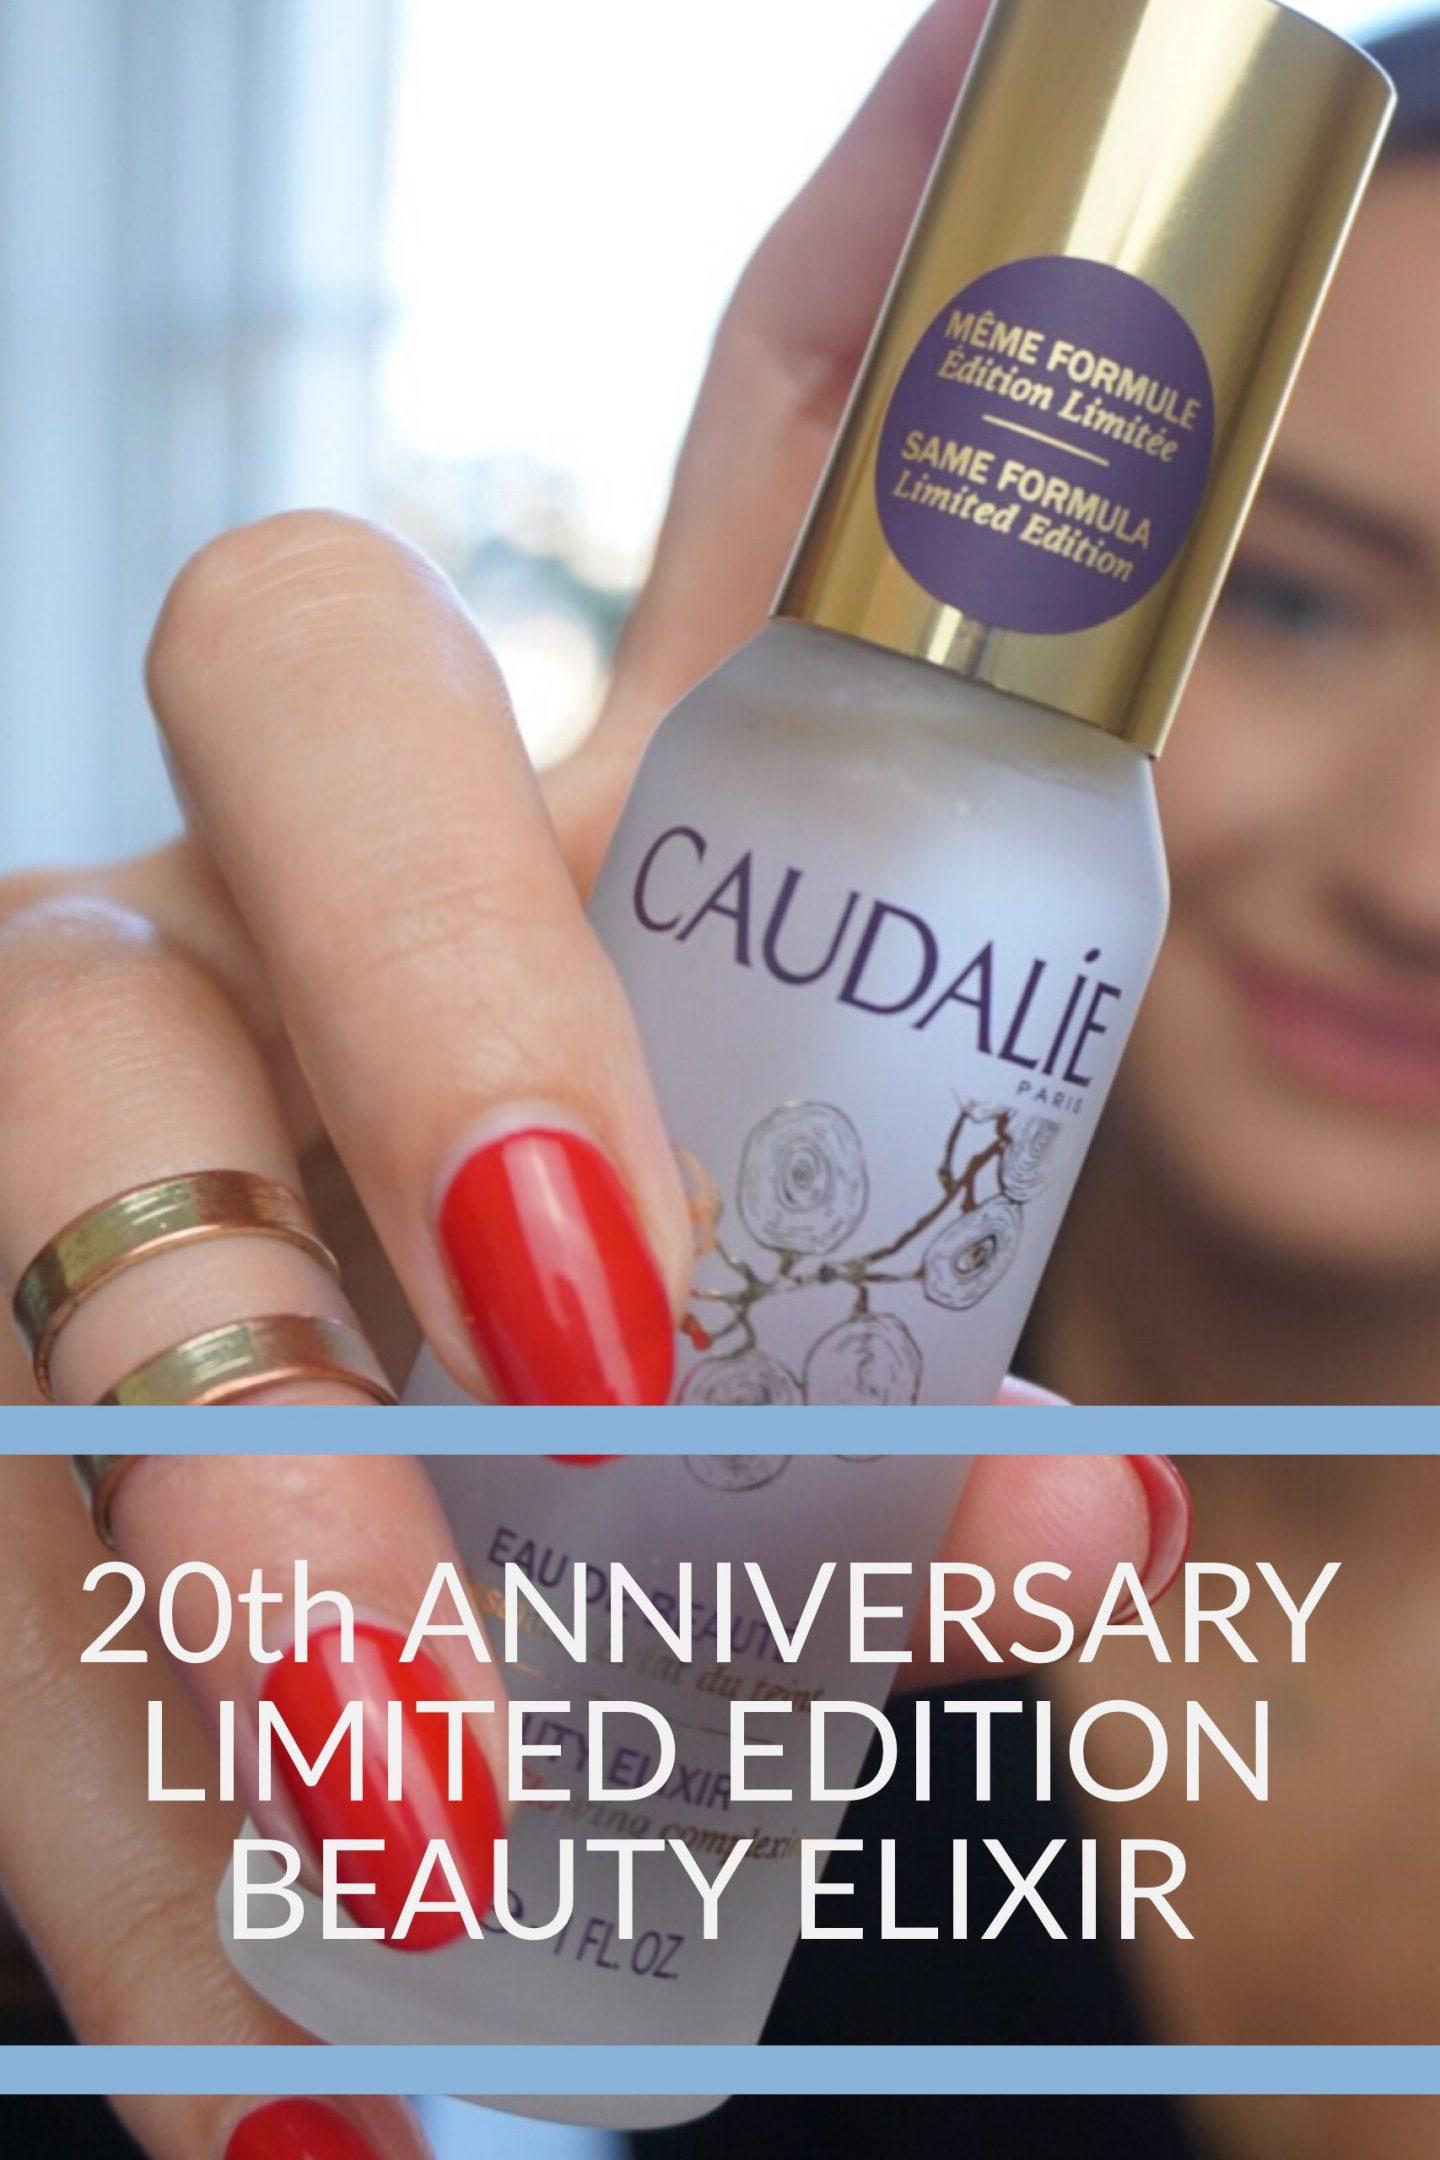 Caudalie Beauty Elixir Celebrates 20 years